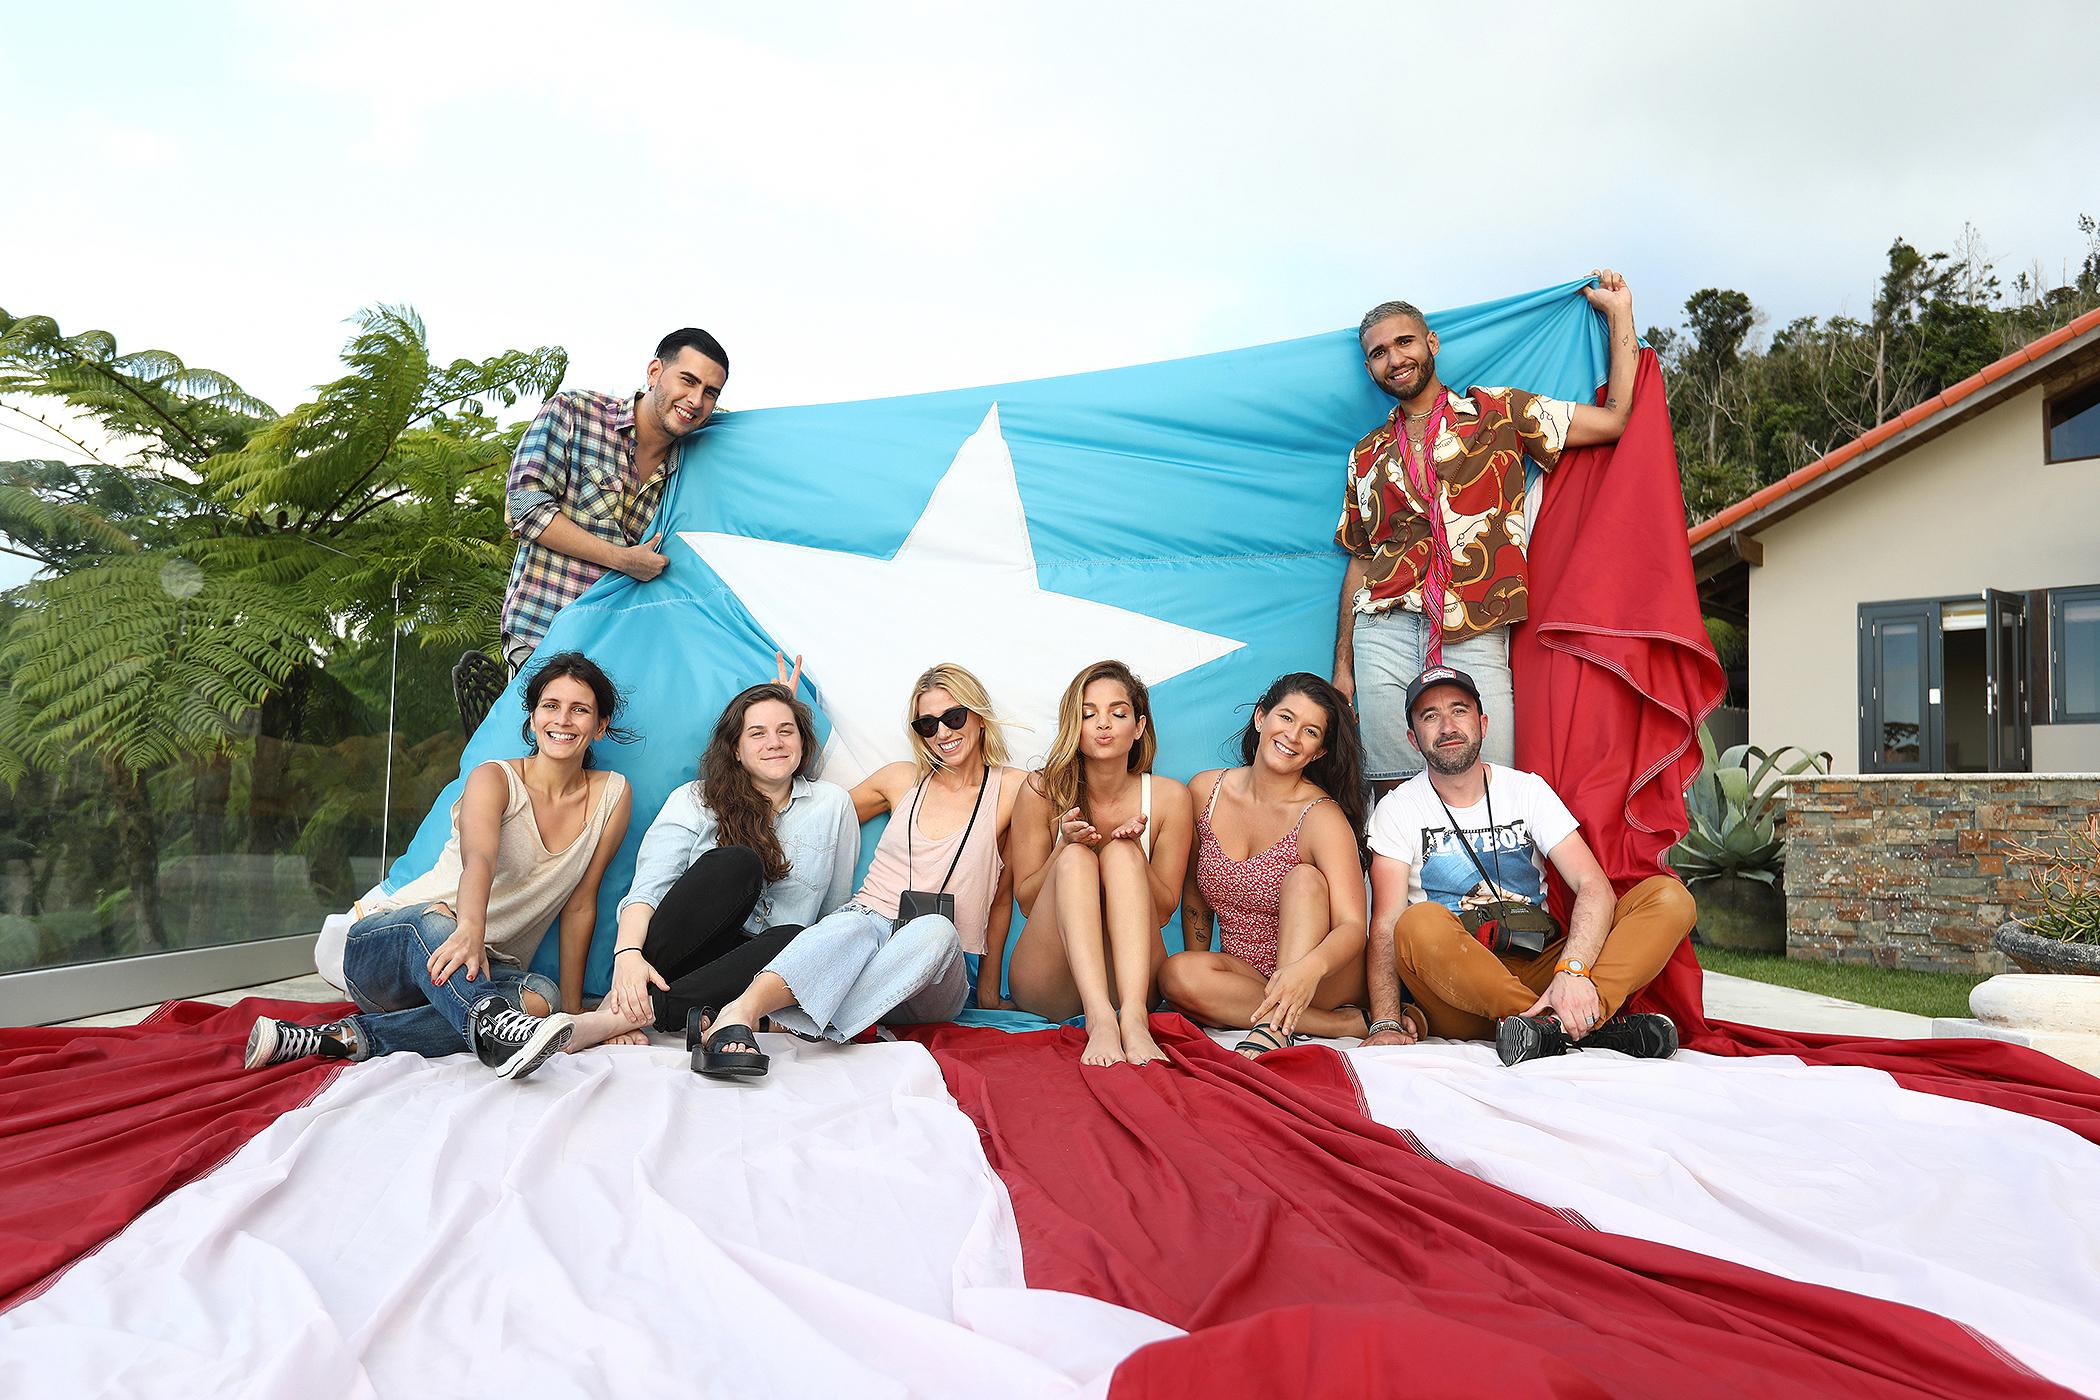 ana dias playboy team in puerto rico